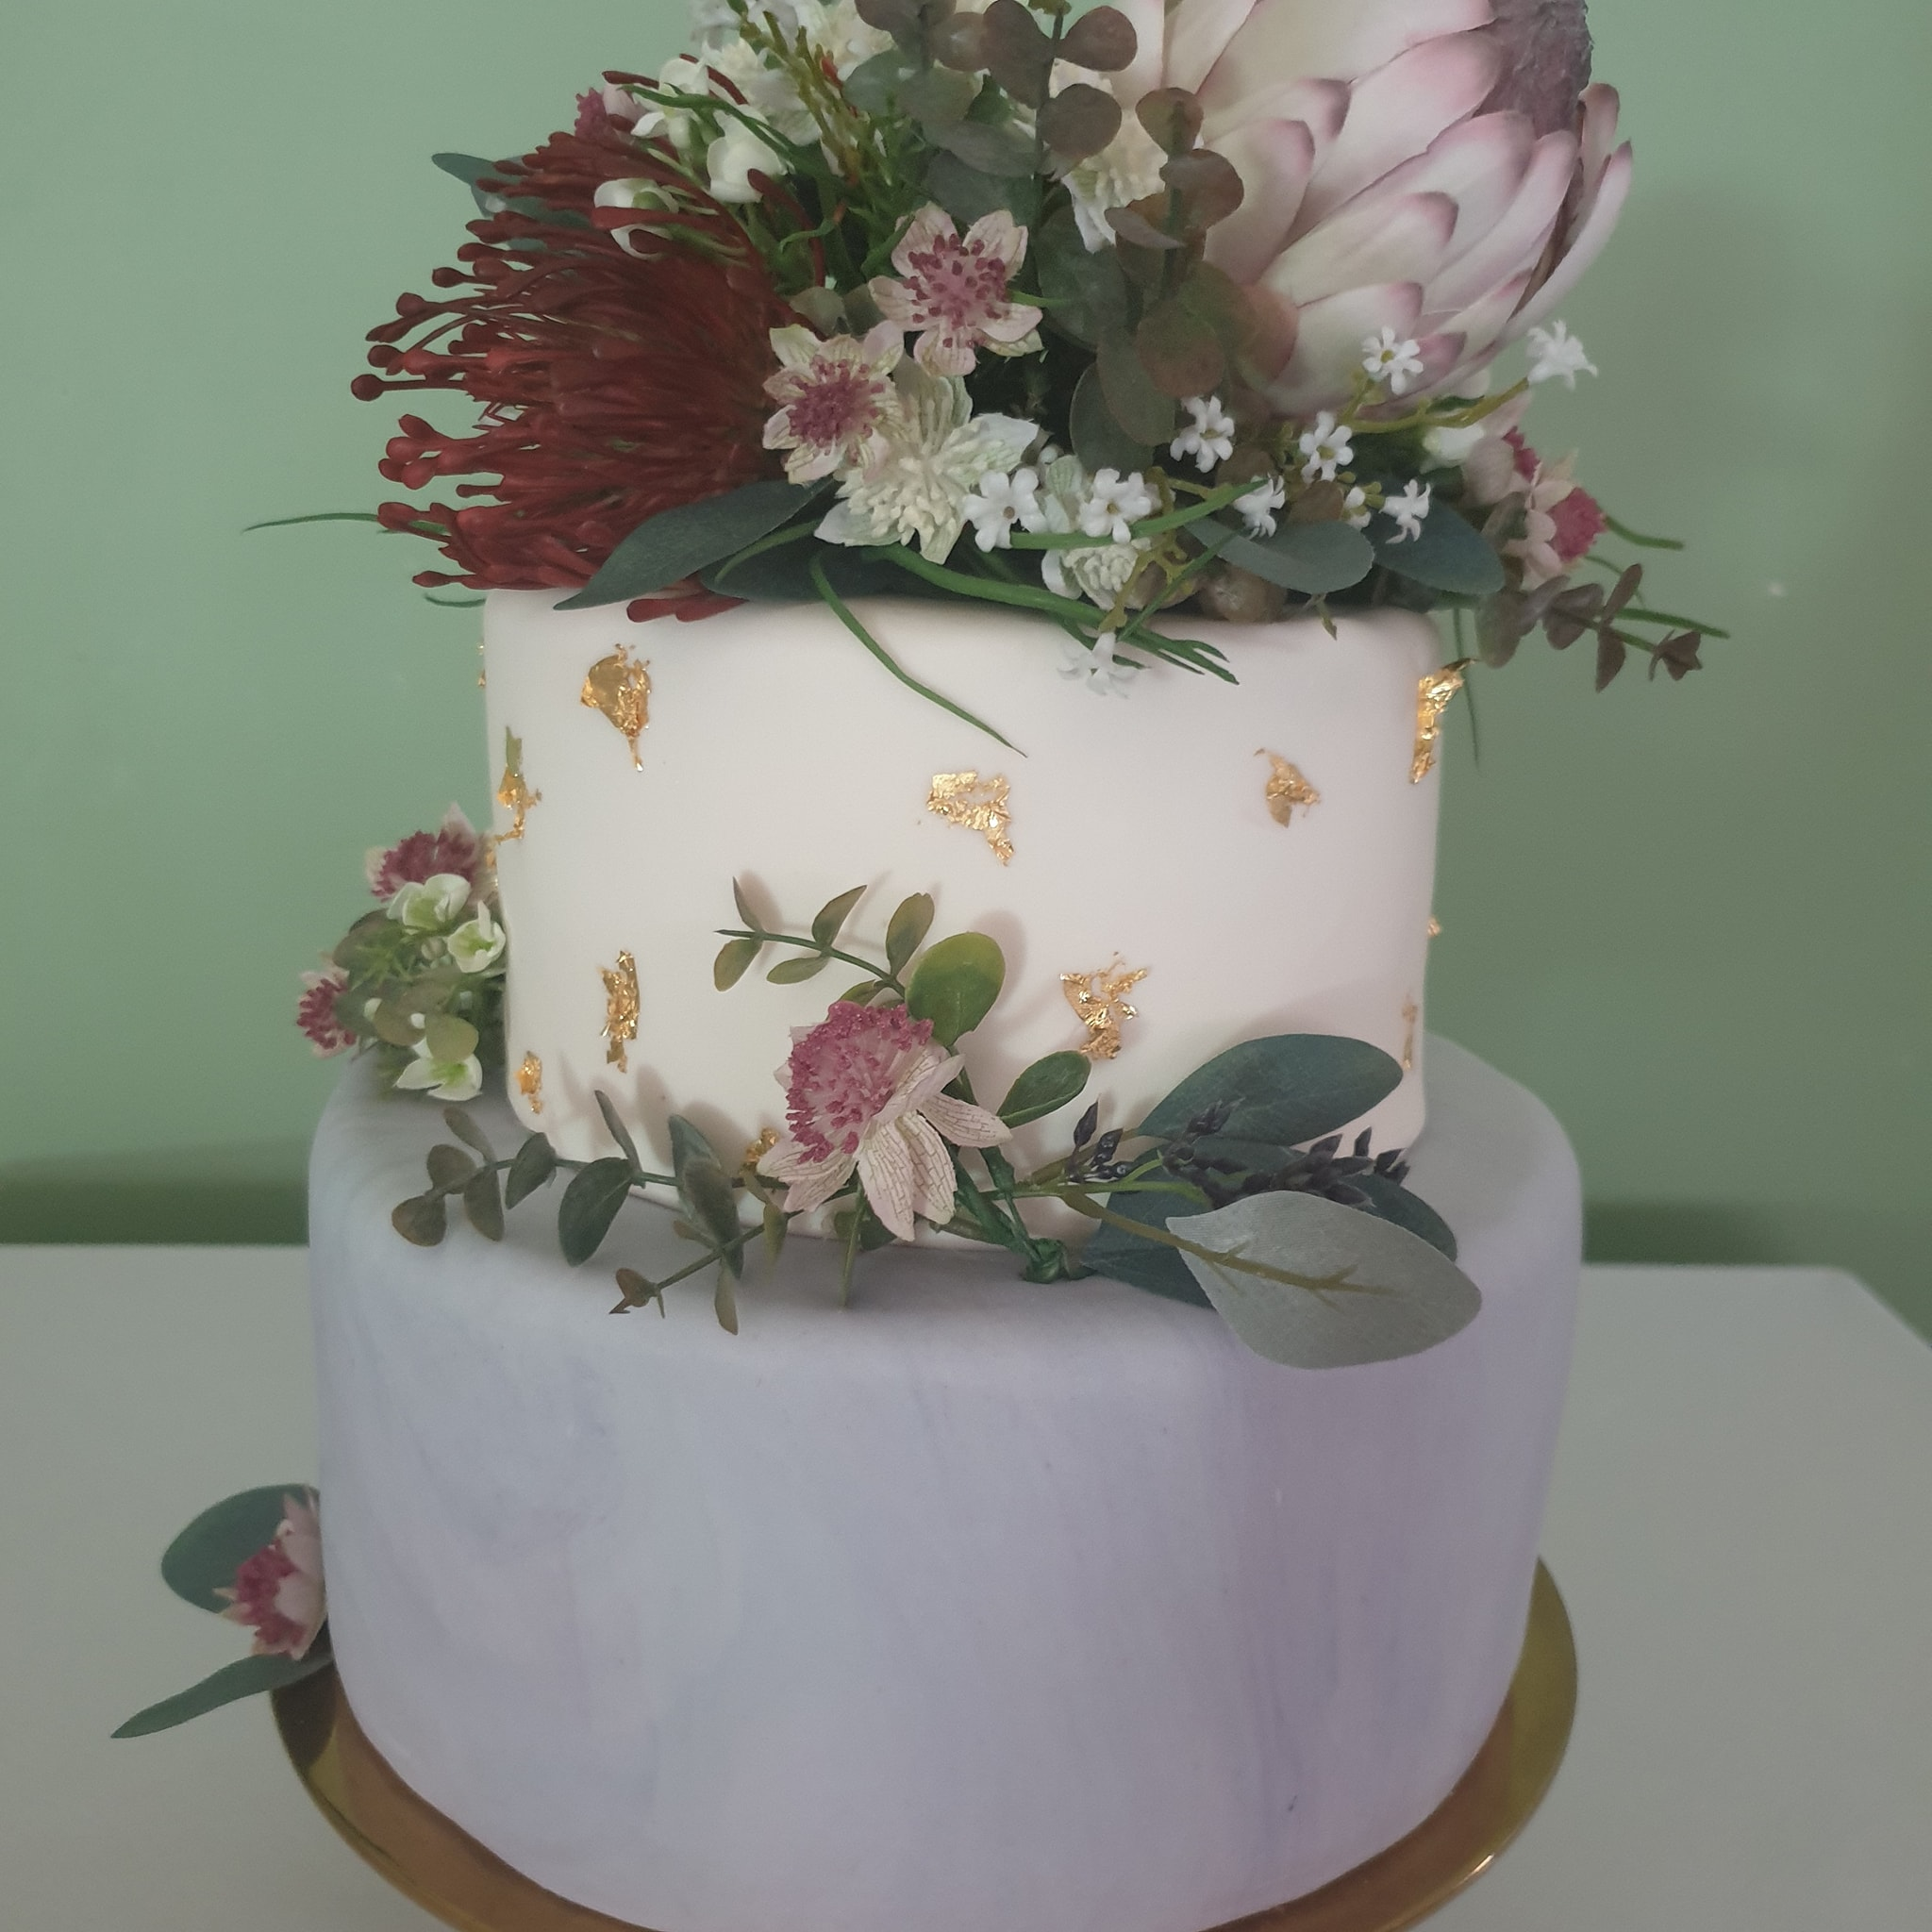 Monique's Designer Cakes | Yamba Wedding Cakes